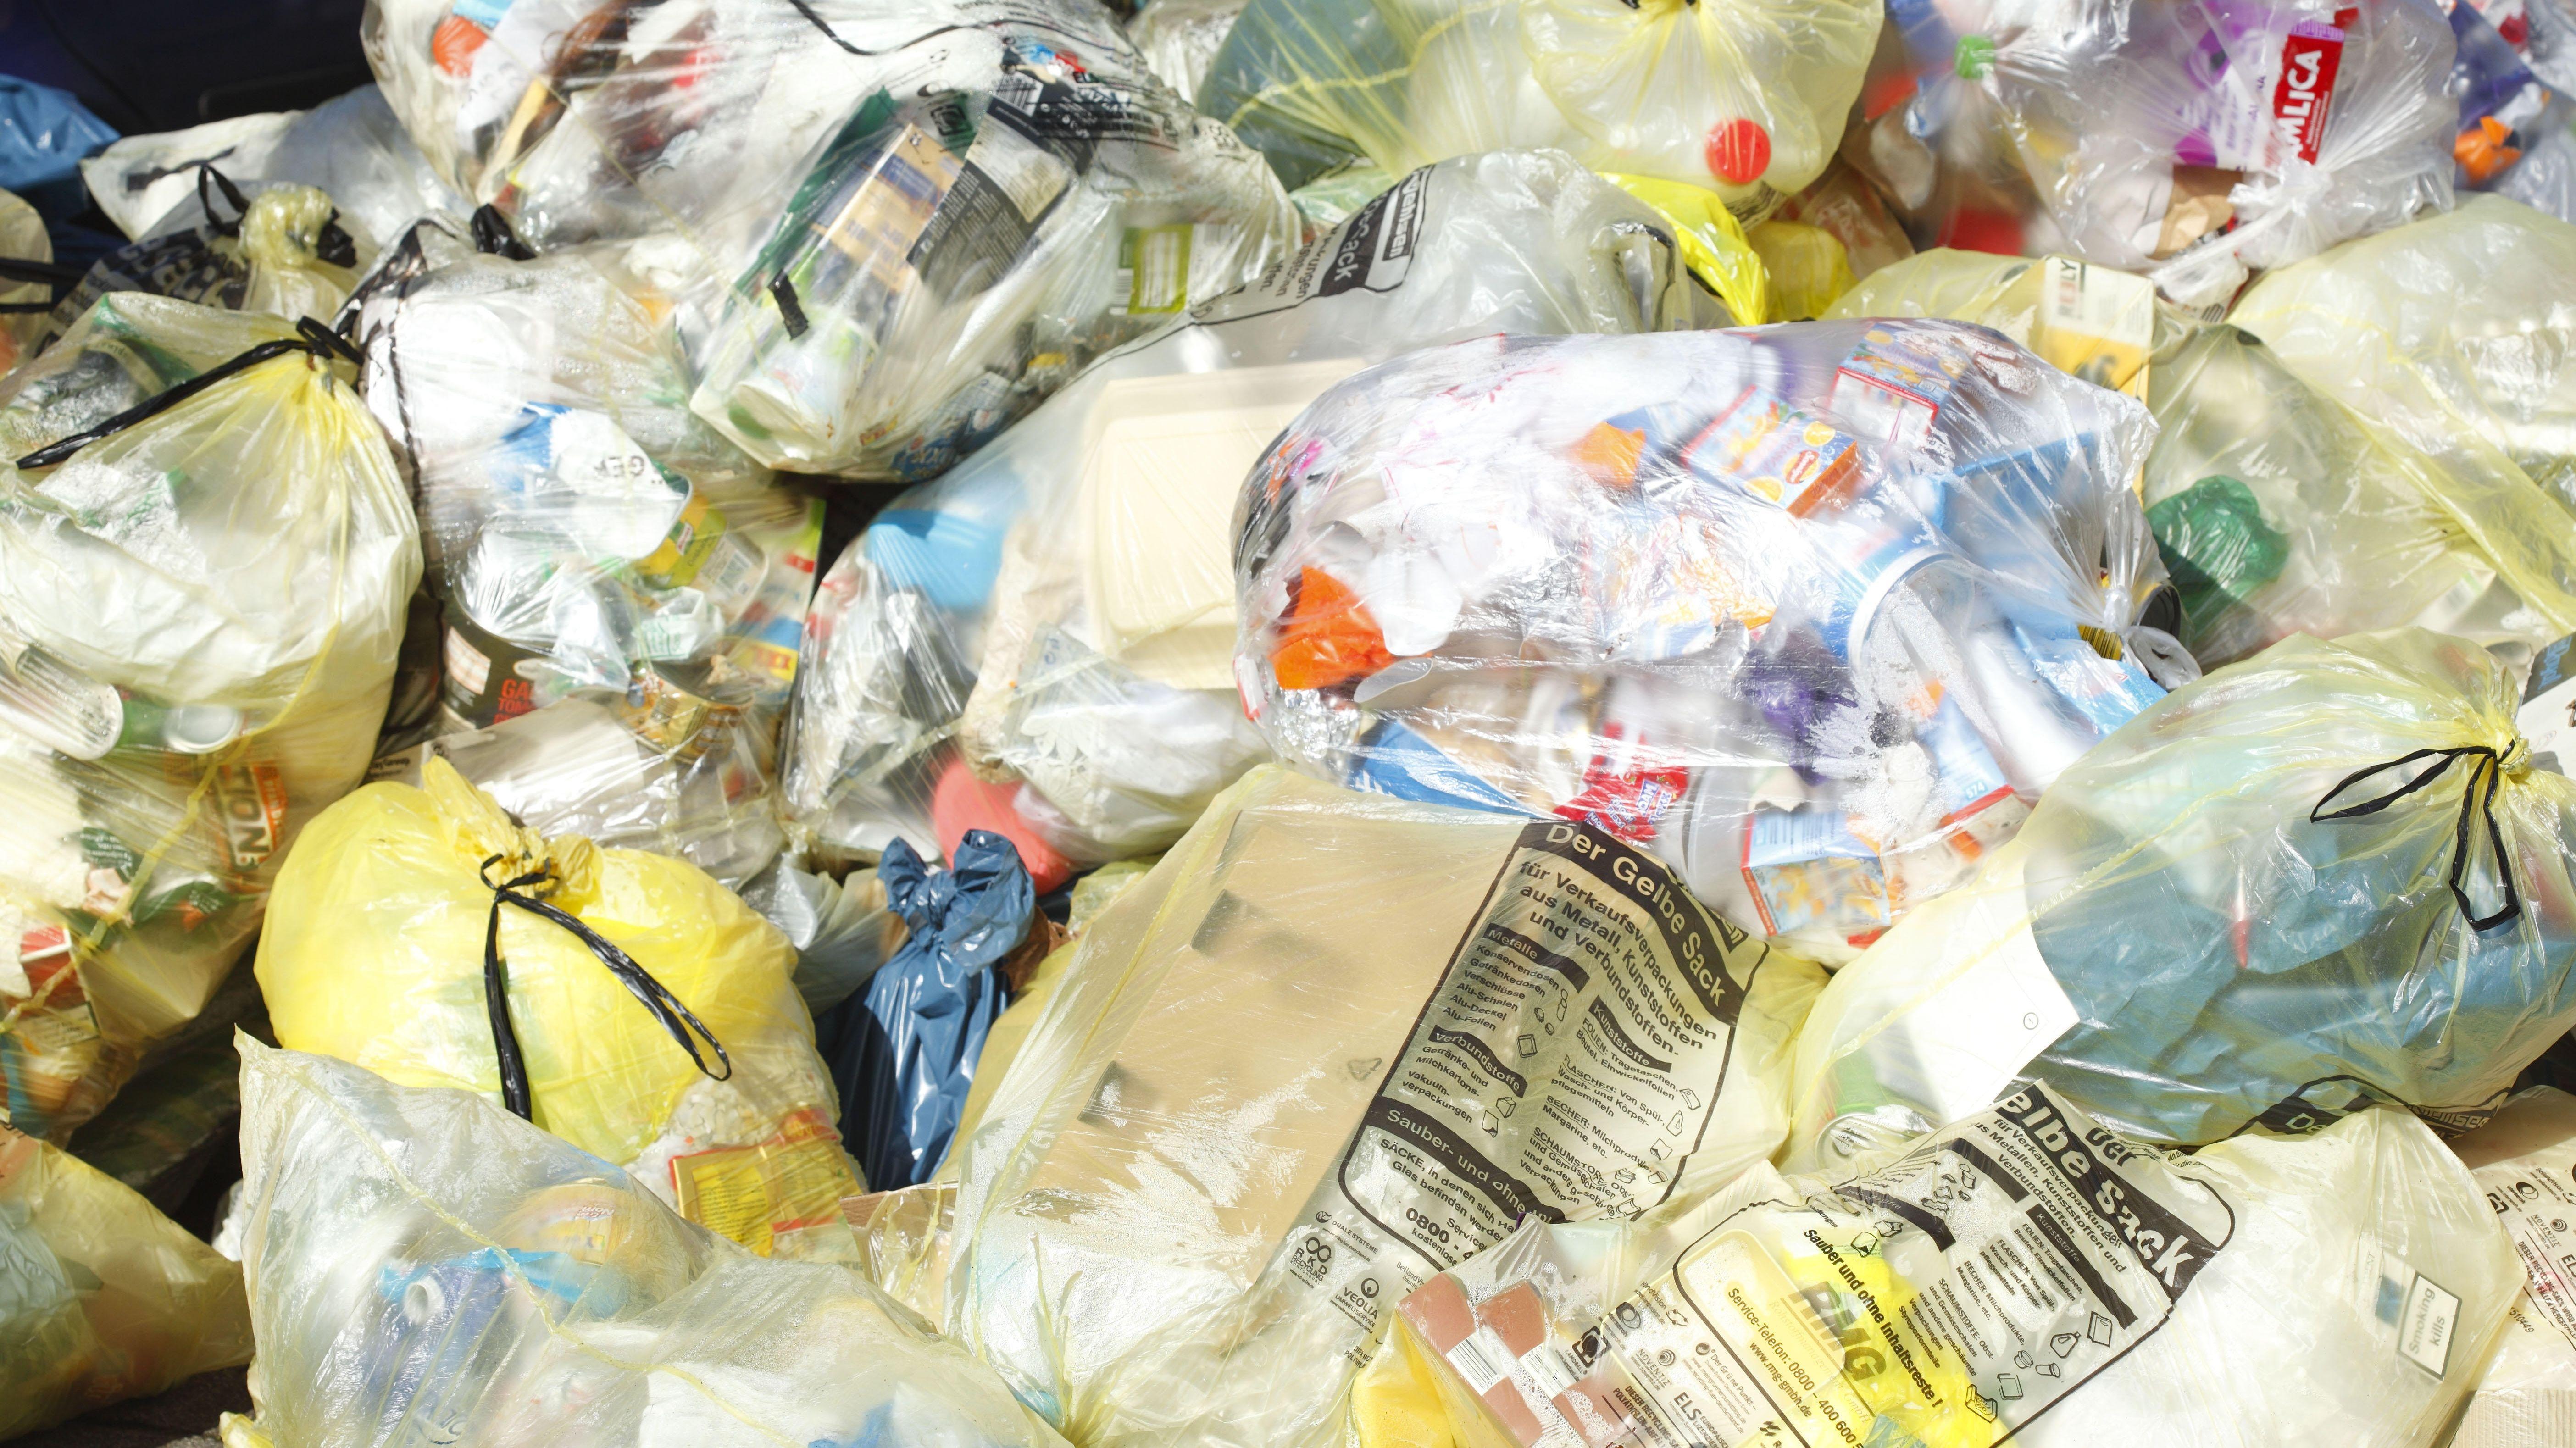 Gelbe Säcke mit Plastikmüll am Straßenrand.